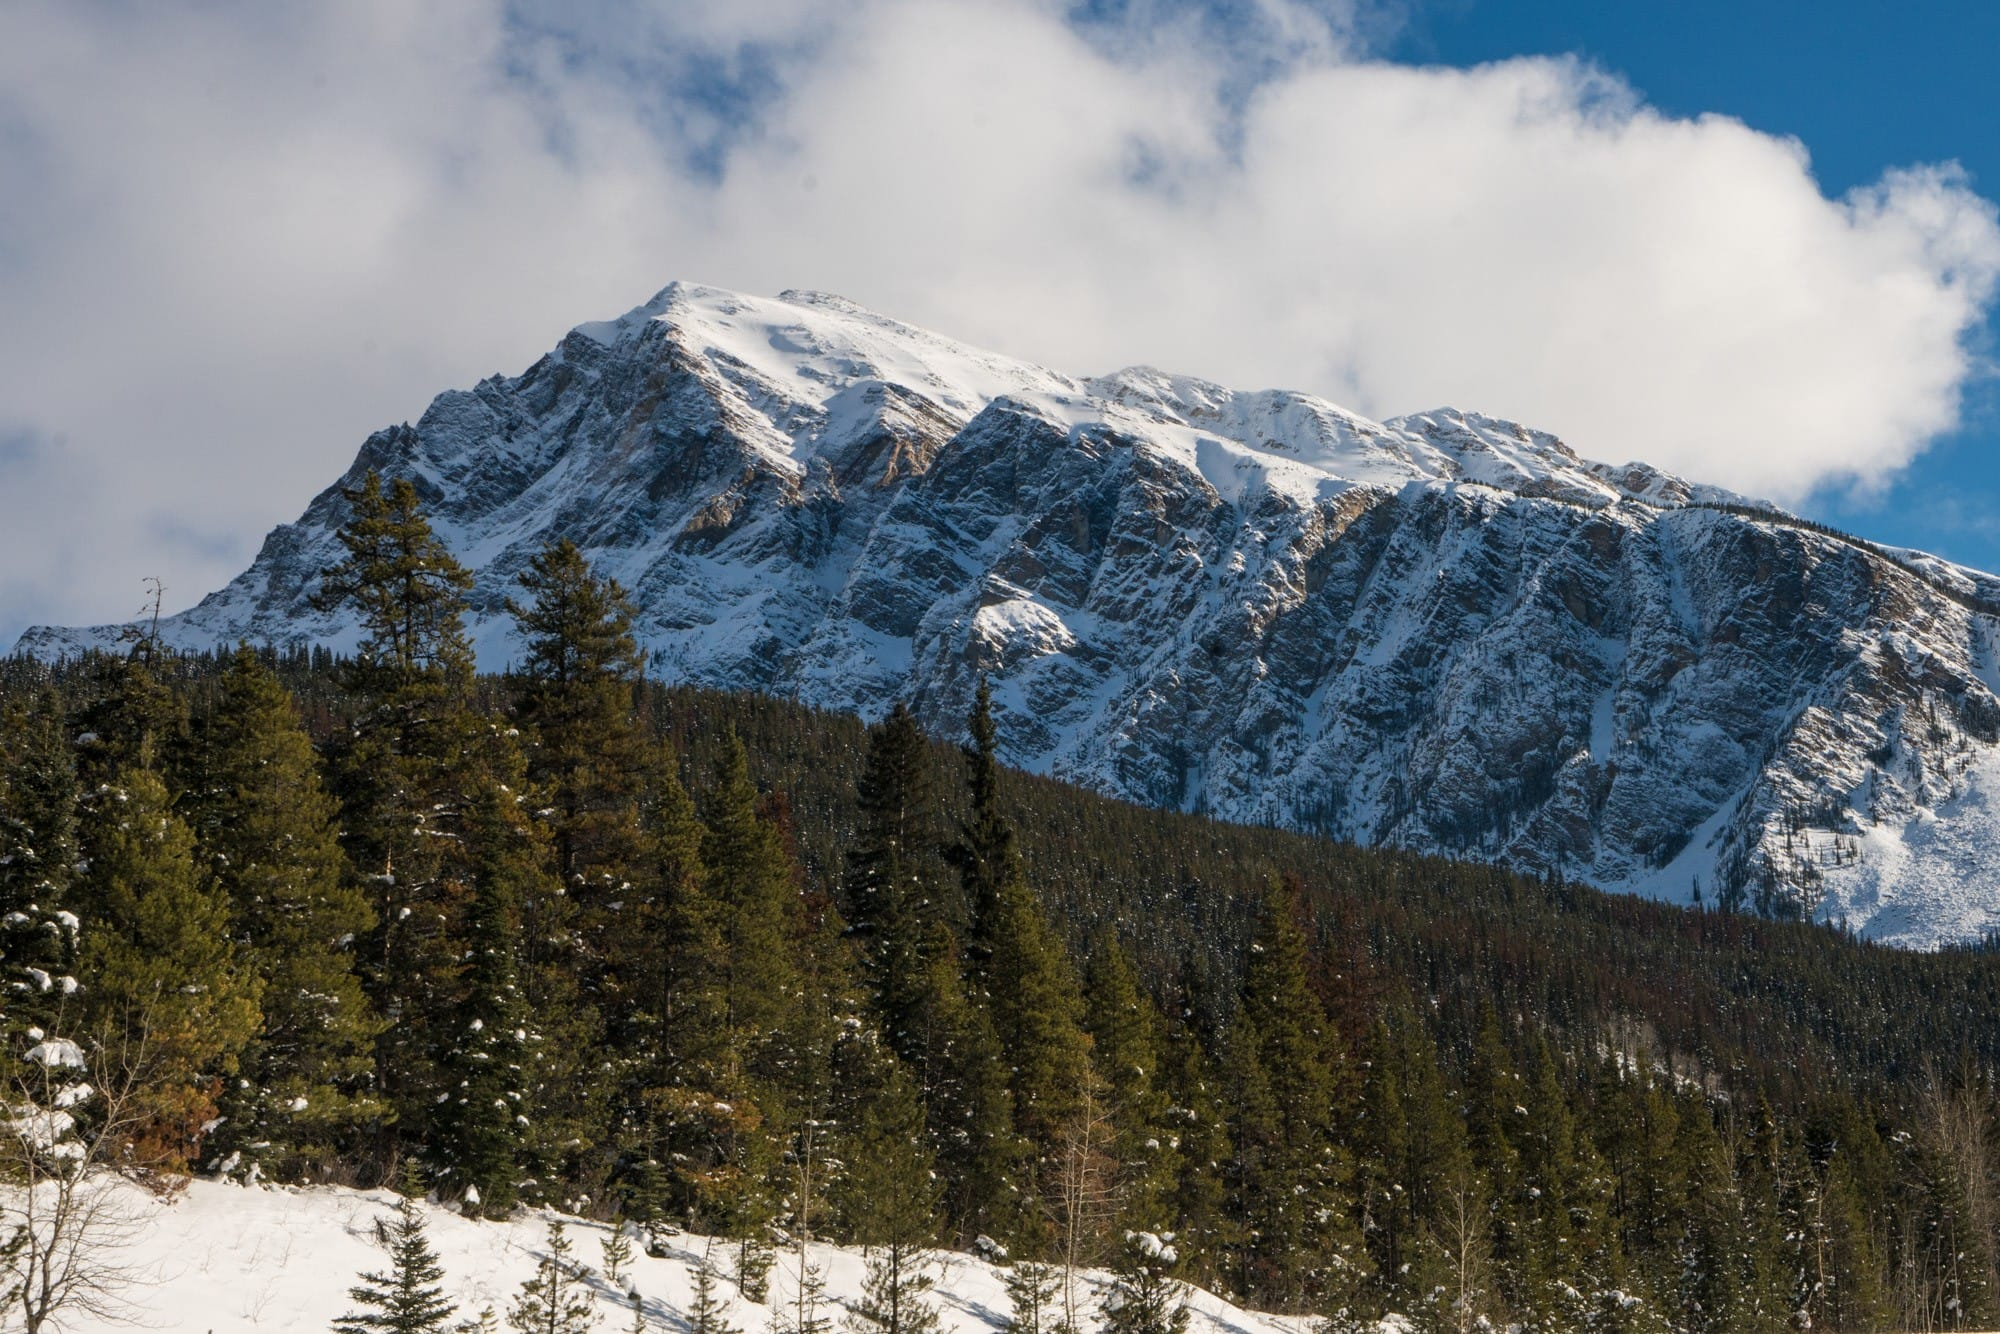 Icefields Parkway - Visit Jasper in Winter